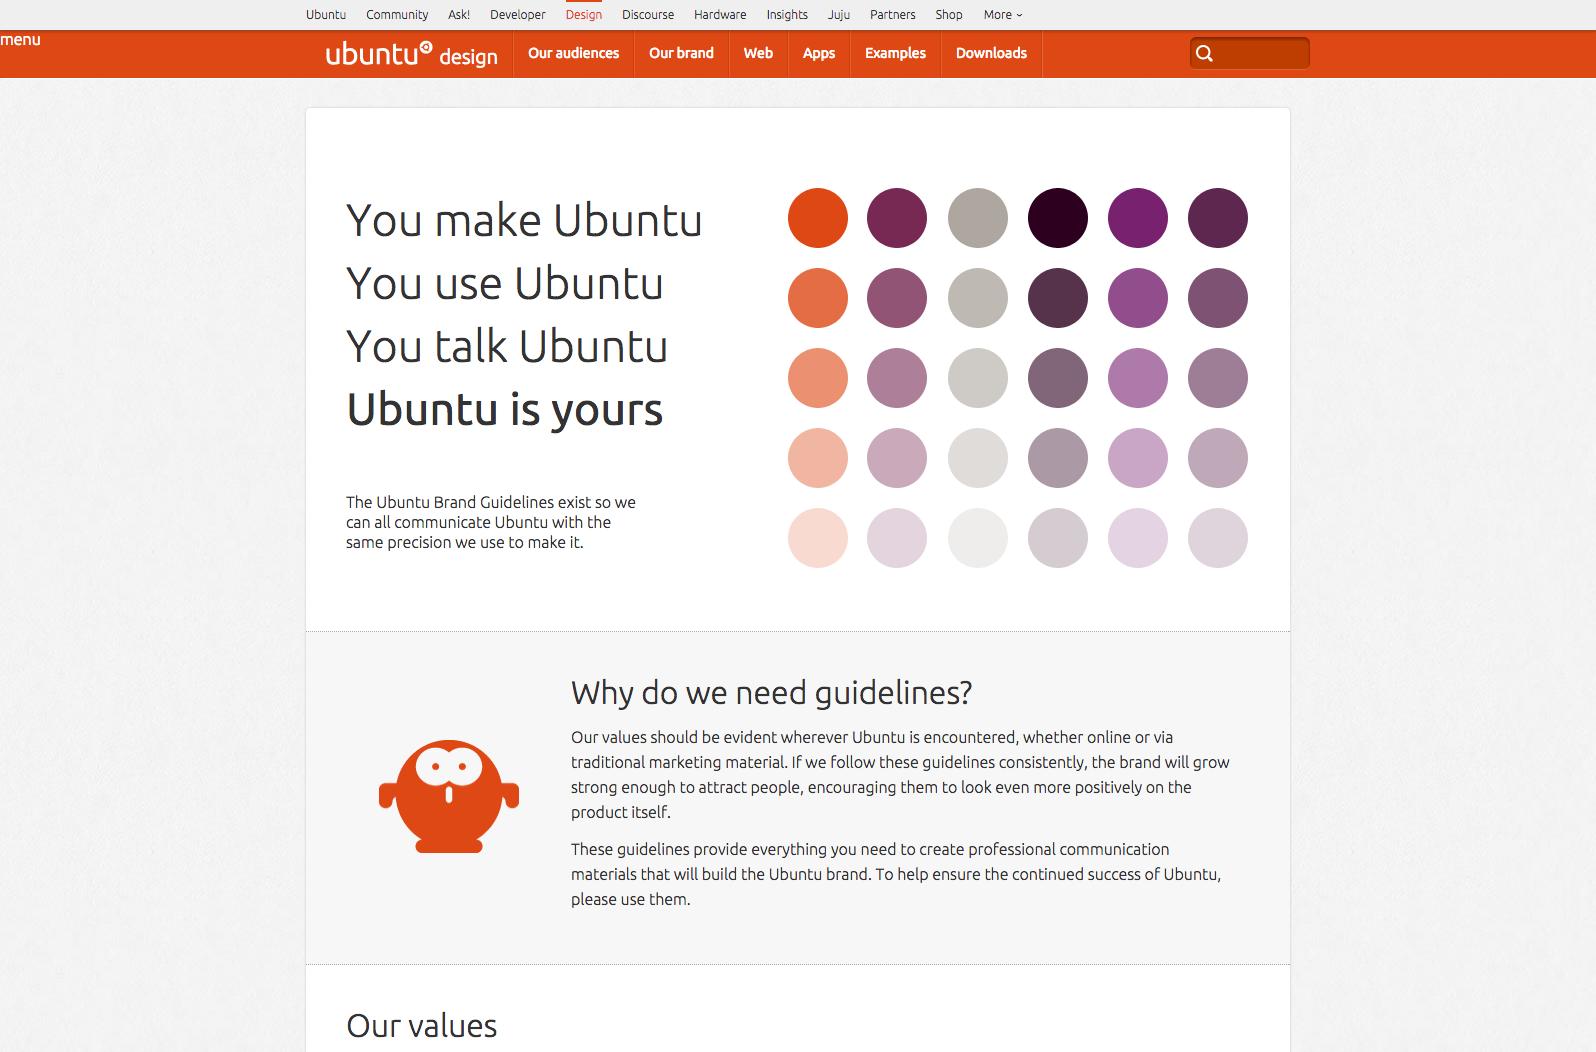 ubuntu-guidelines | web-crunch.com